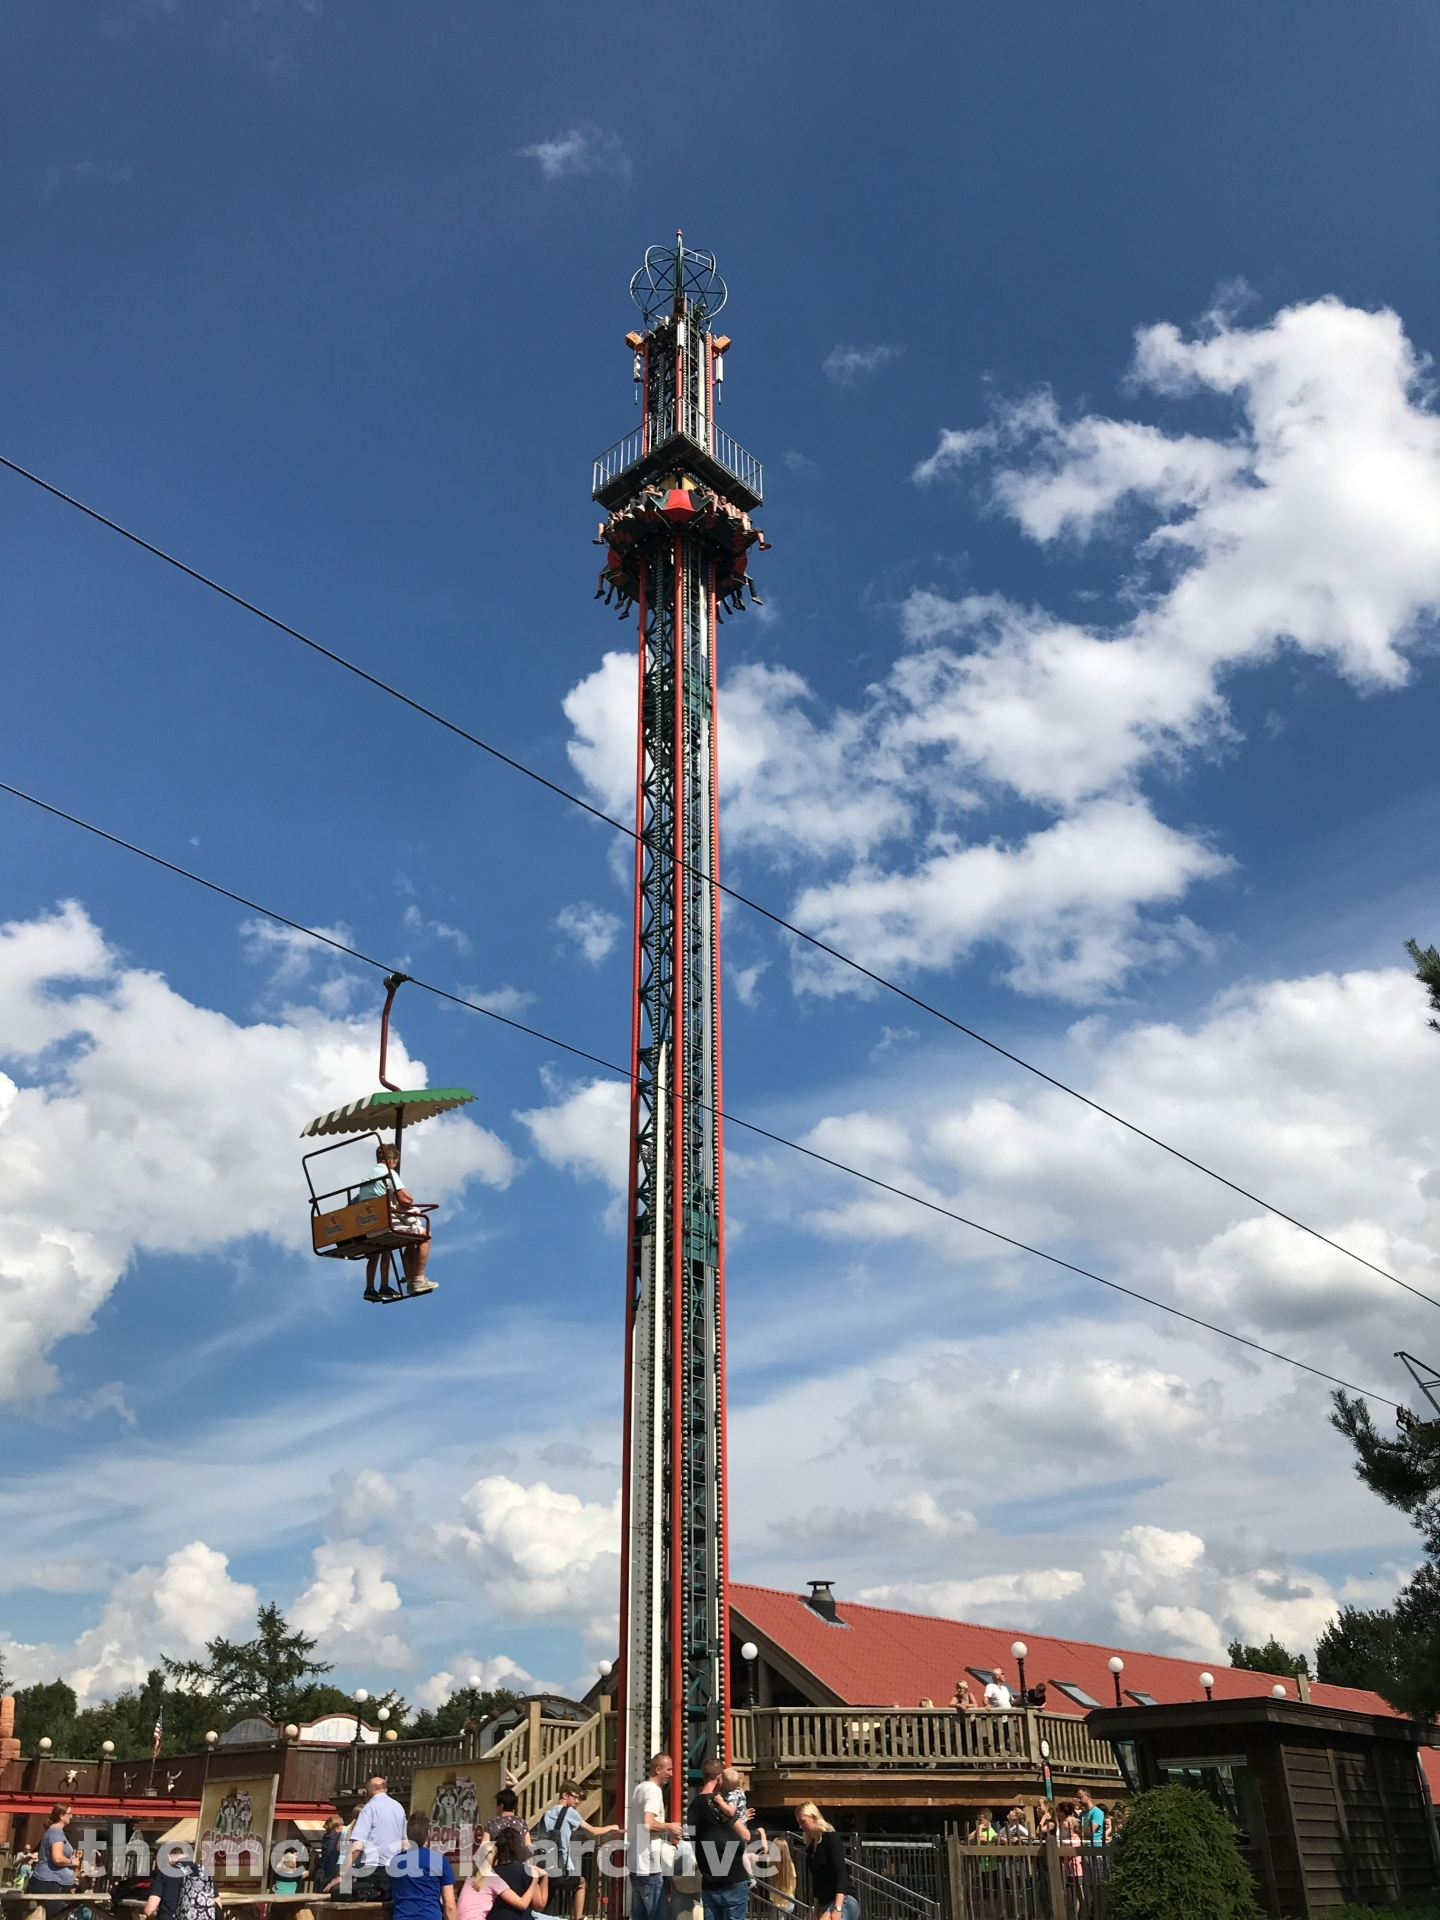 Free Fall at Attractiepark Slagharen